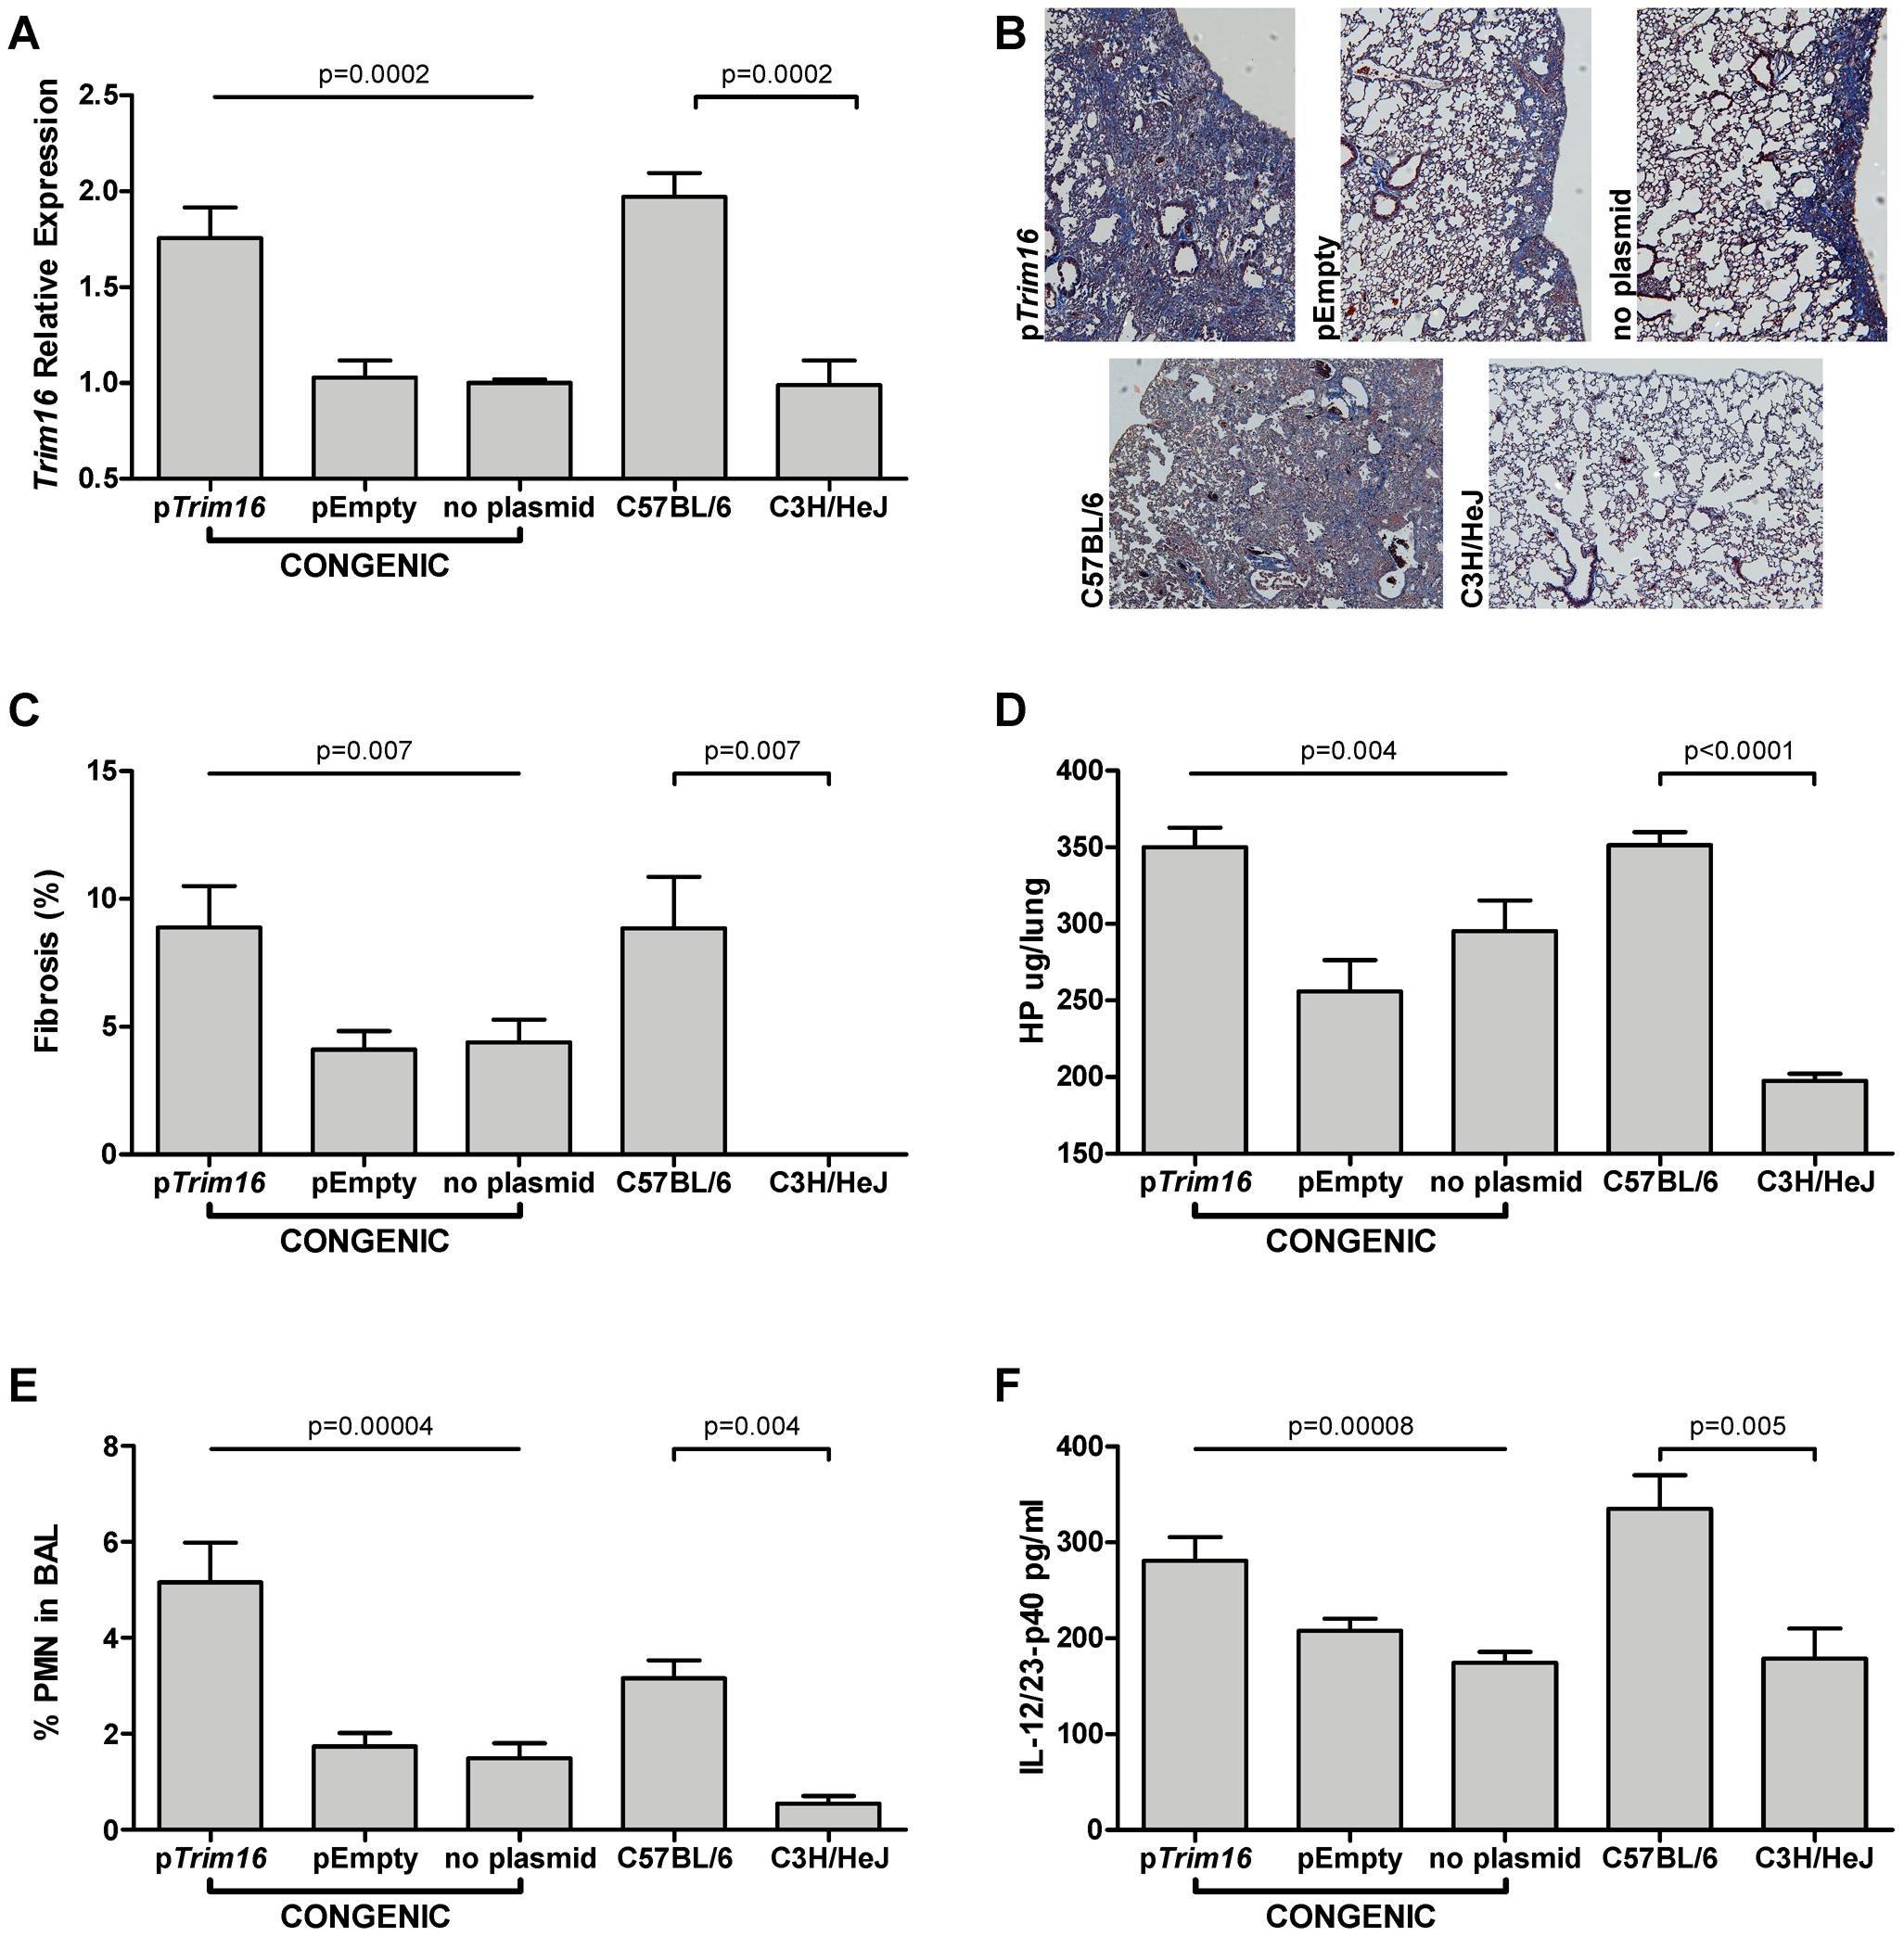 <i>Trim16</i> over-expression increases pulmonary fibrosis in <i>Blmpf2</i> subcongenic mice.